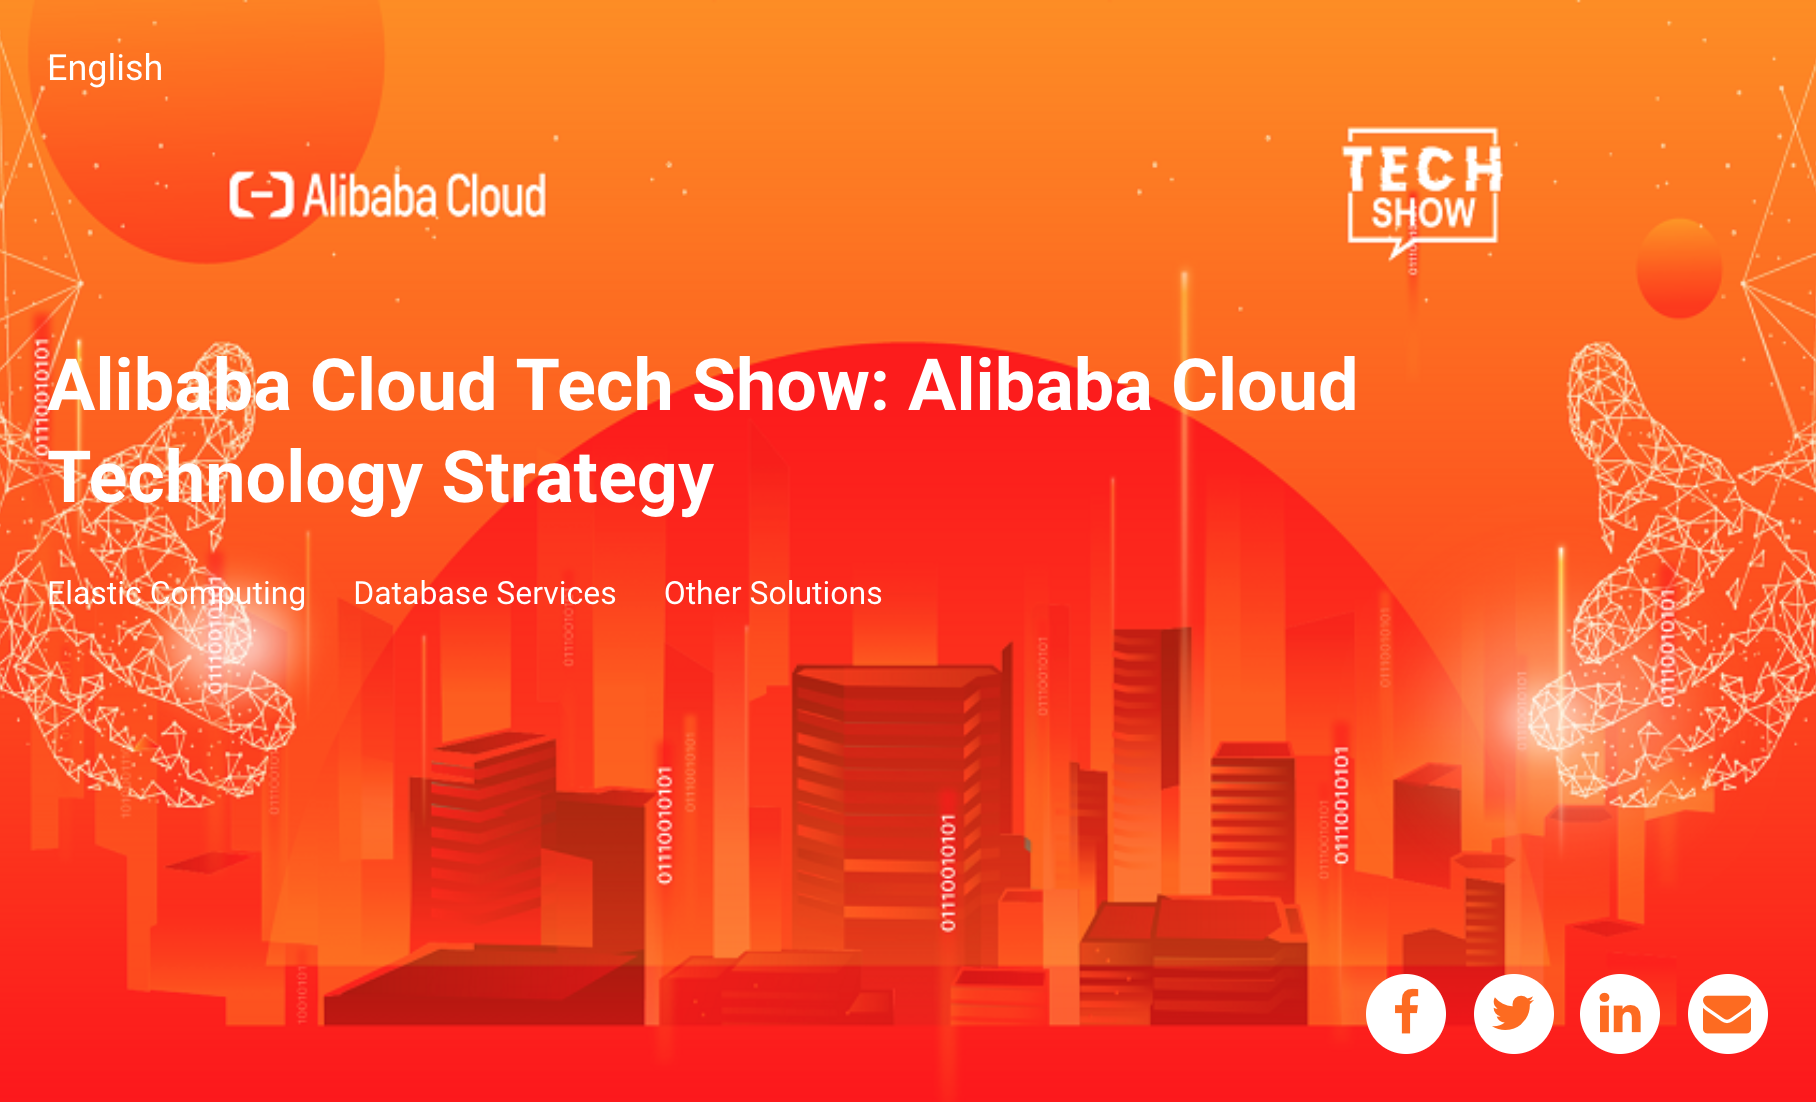 Alibaba Cloud Tech Show: Alibaba Cloud Technology Strategy